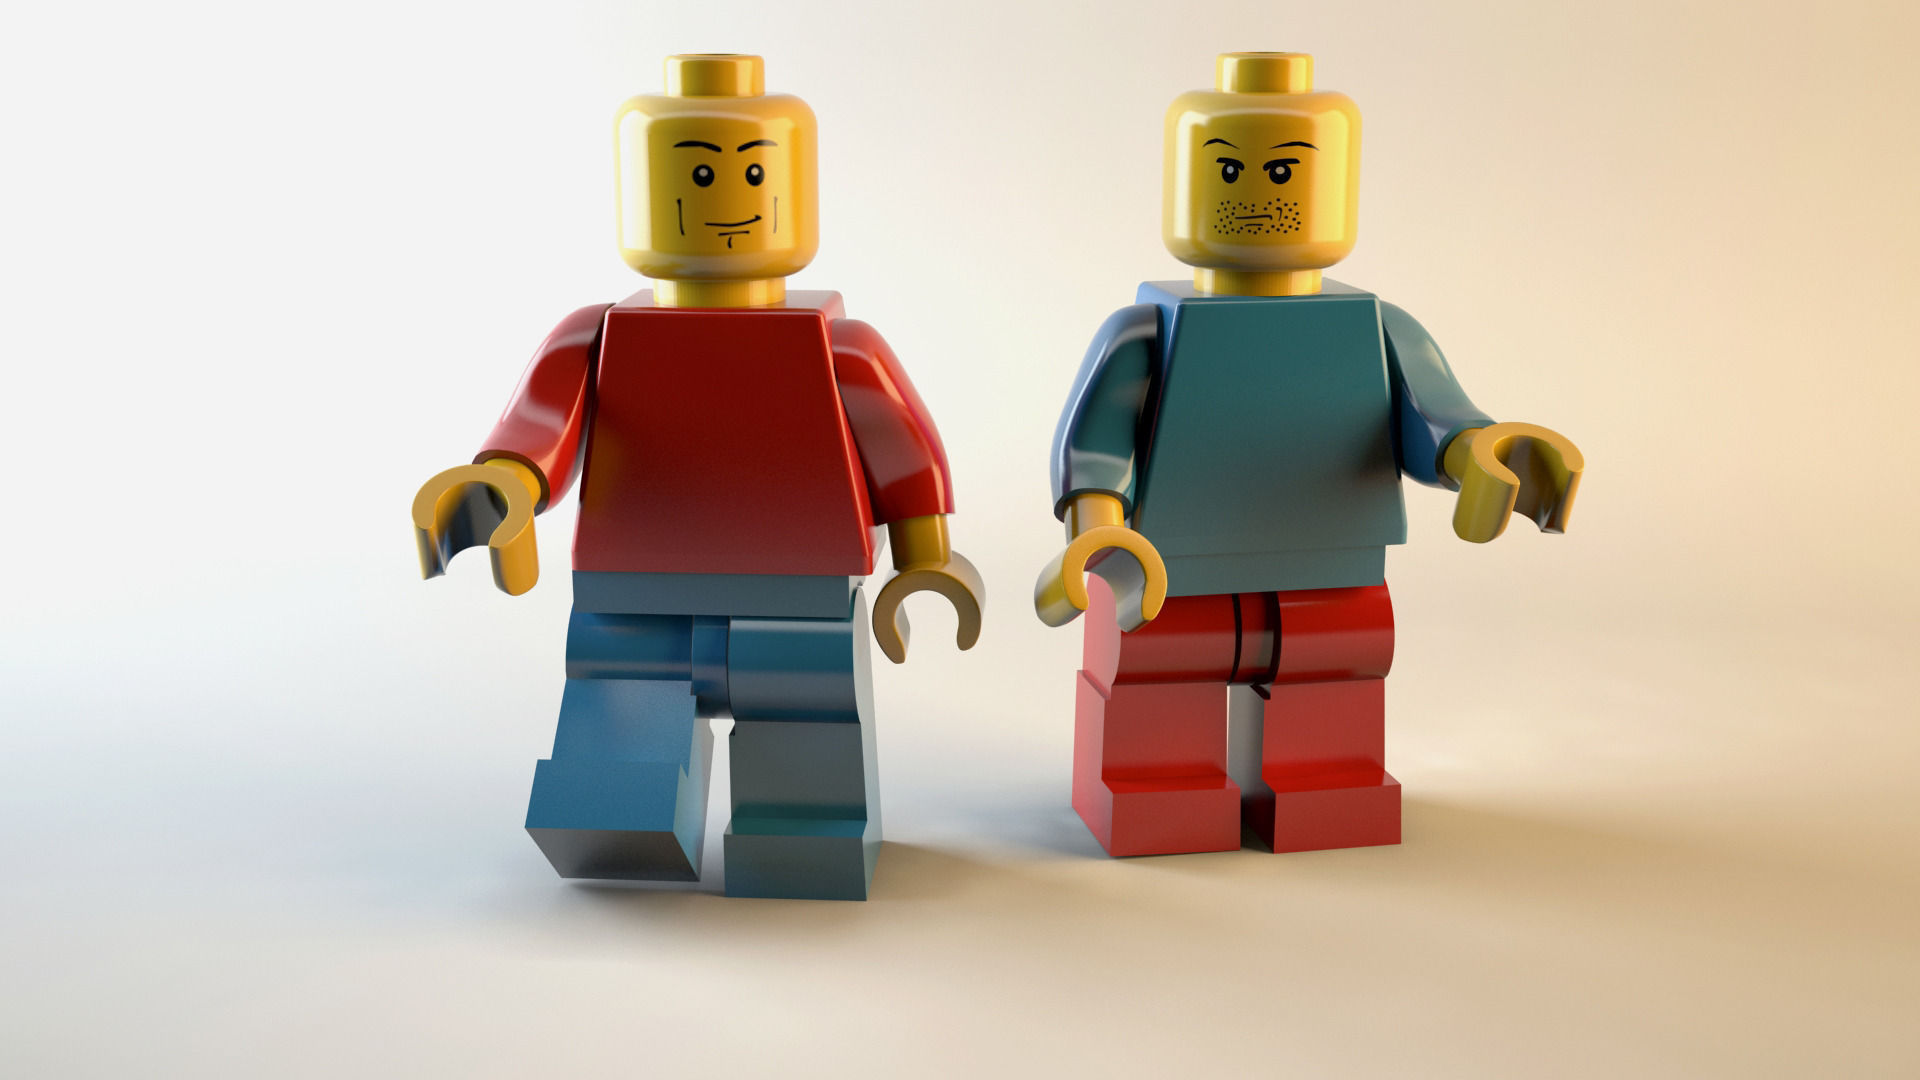 Lego man 3D Model MAX OBJ | CGTrader.com